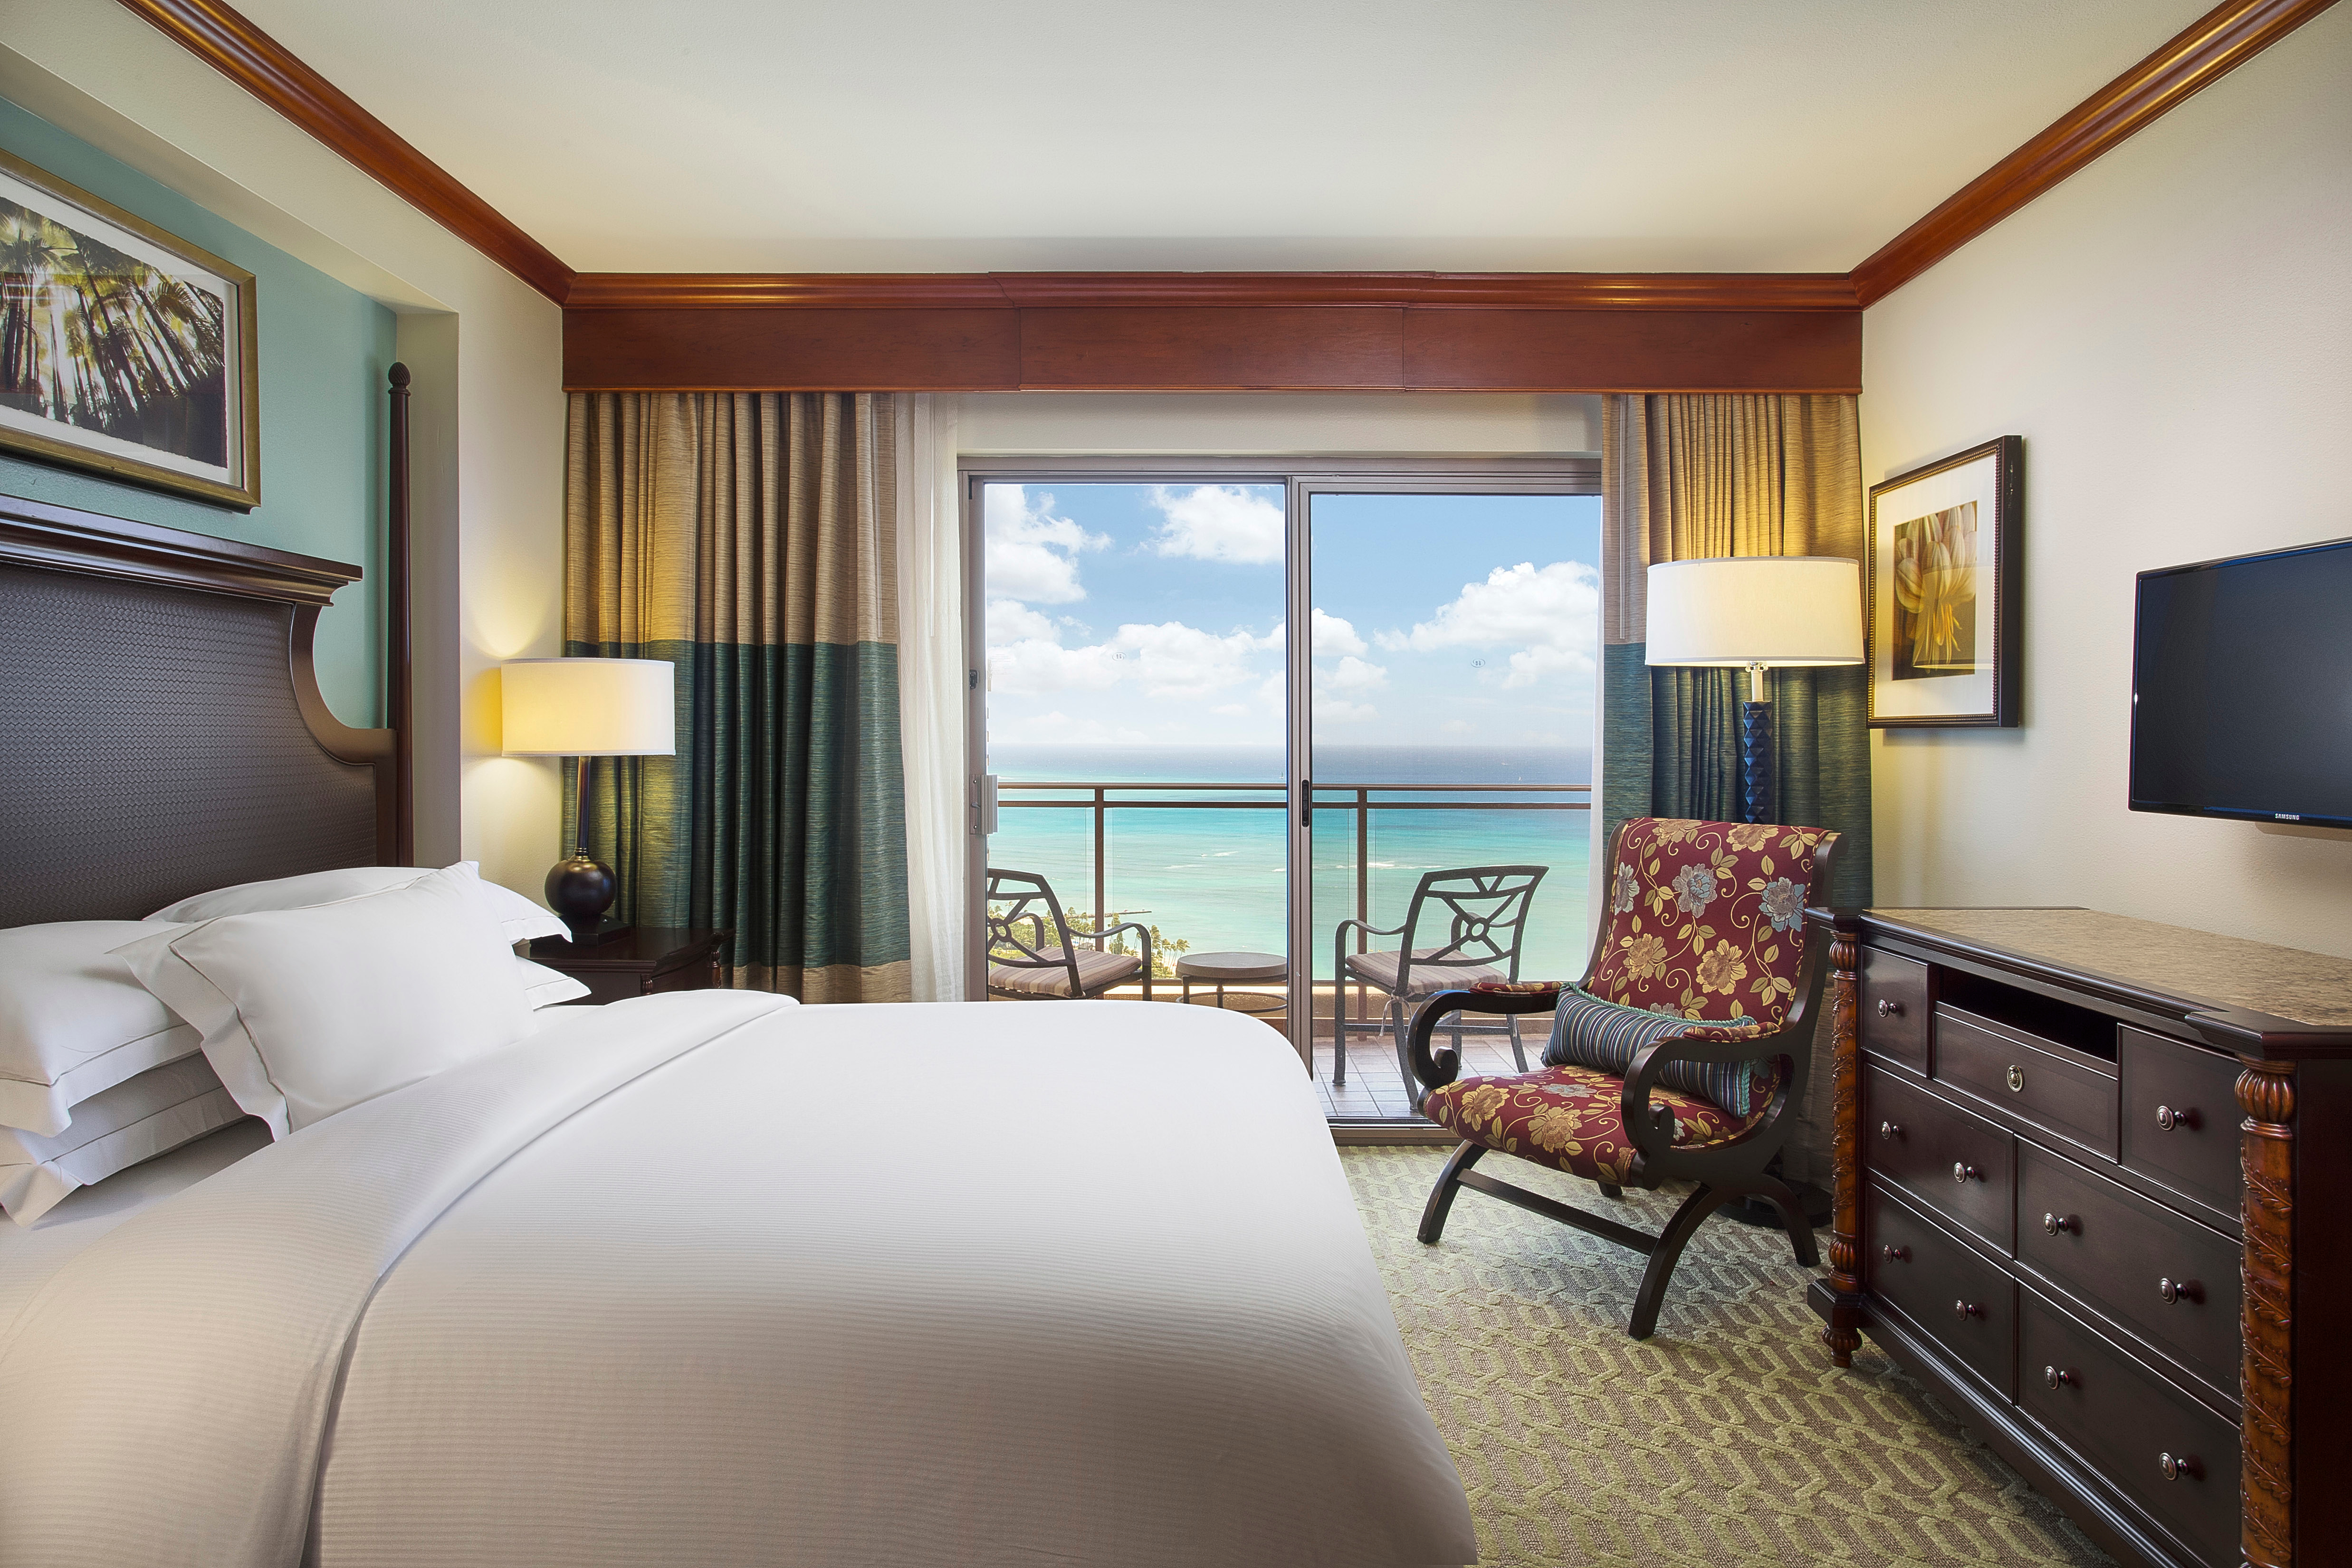 Grand waikikian by hilton grand vacations honolulu hawaii - 3 bedroom suites in honolulu hawaii ...